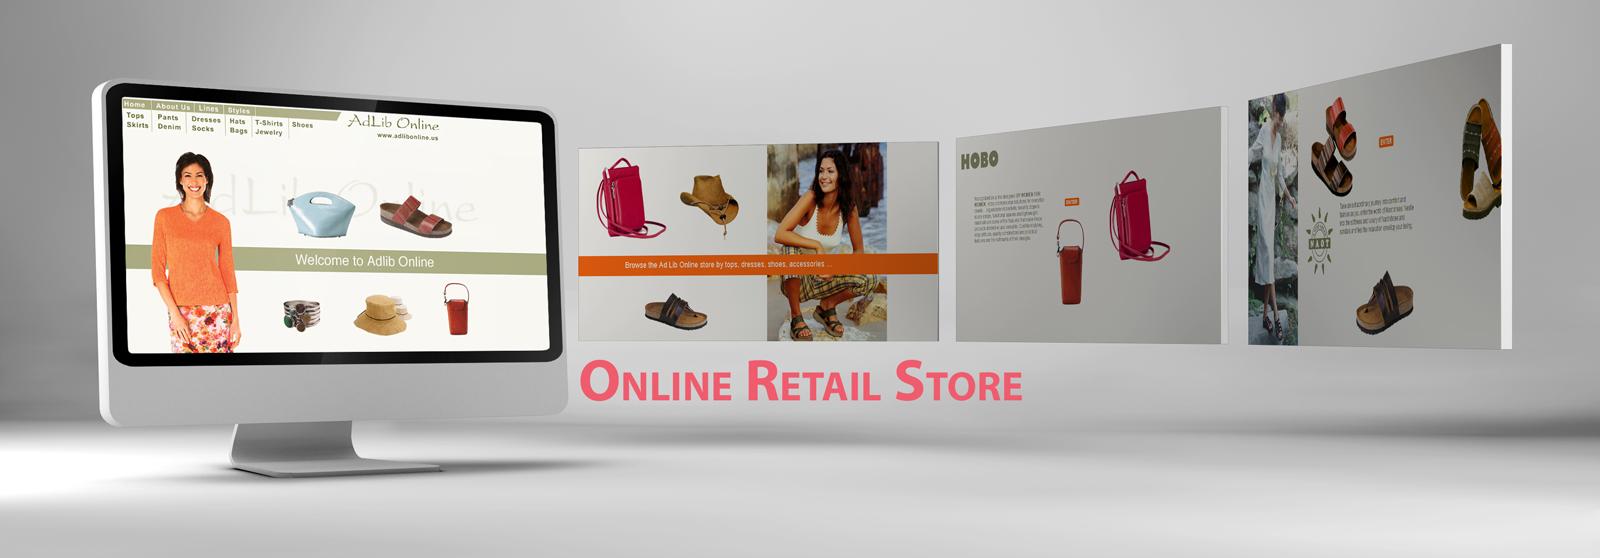 Web Design Sample Asheville Online Retail Store